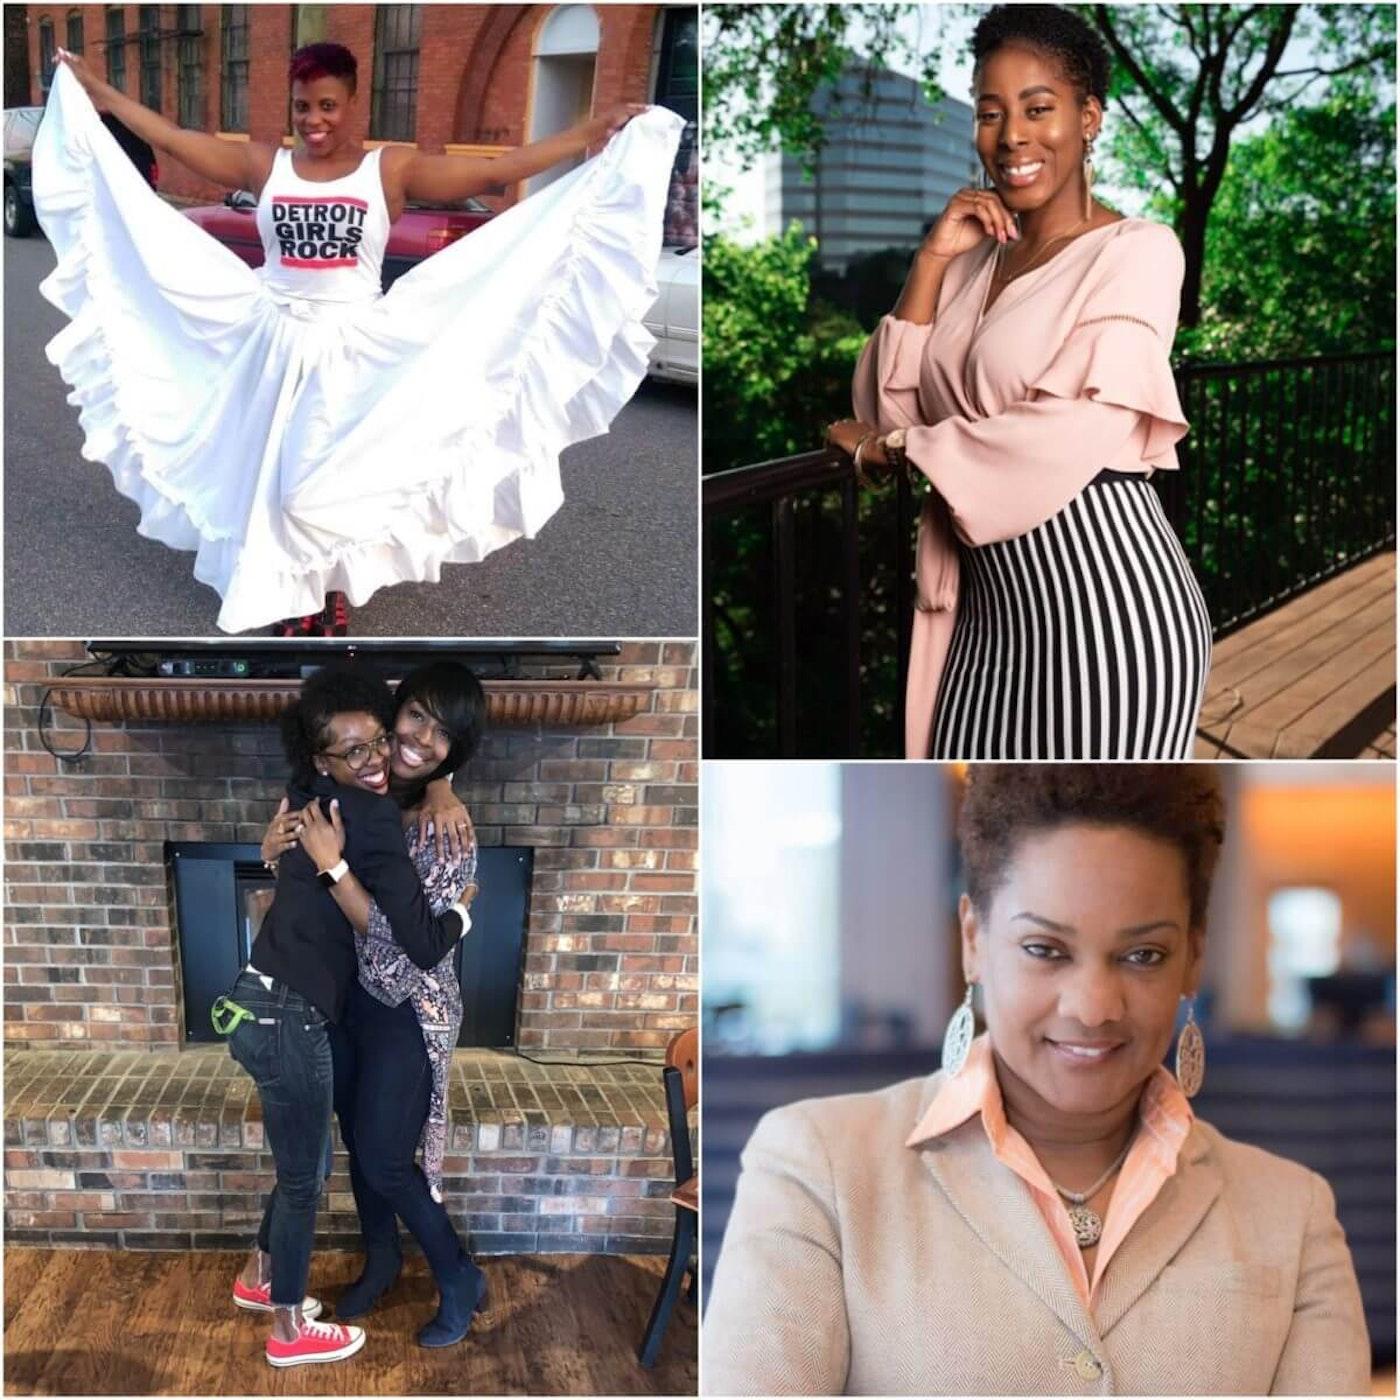 Upper left corner, Nichole Bass-Hawk, lower left corner, Talaya Bates and mother, Sholanda Knott-Johnson, upper right corner, Alicia Howell, lower right, Audra Carson.